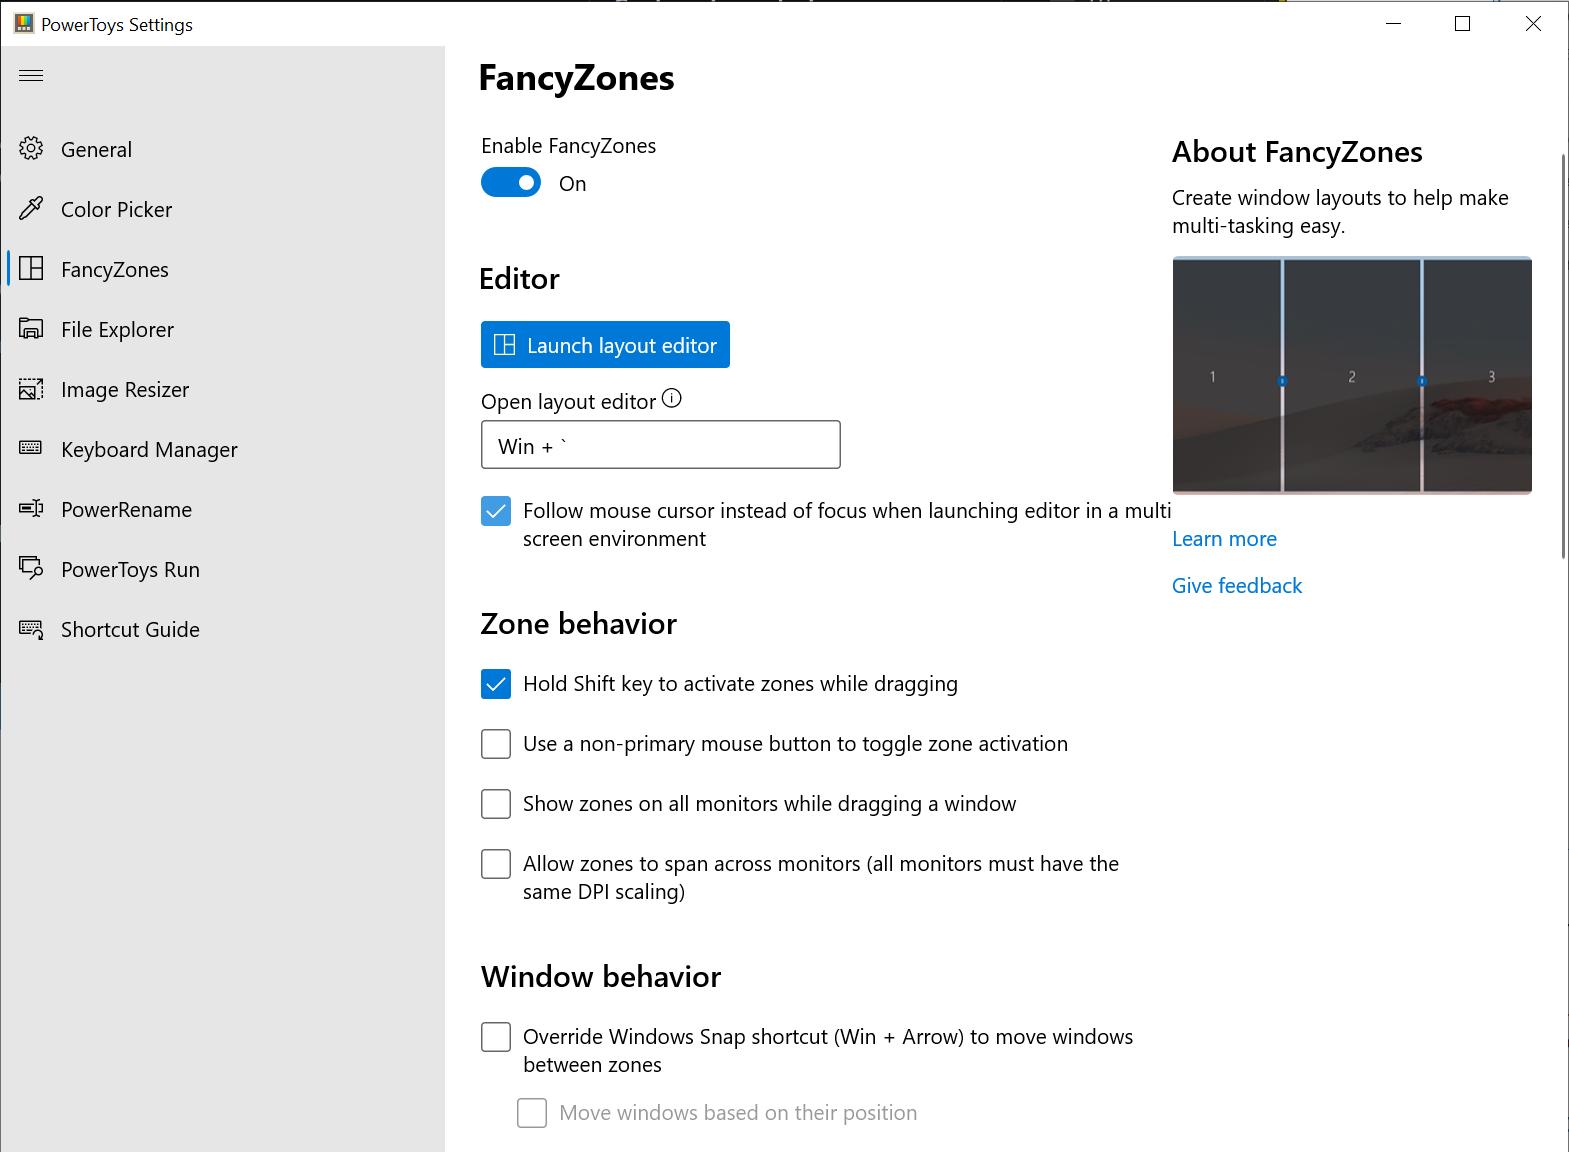 Microsoft PowerToys - FancyZones